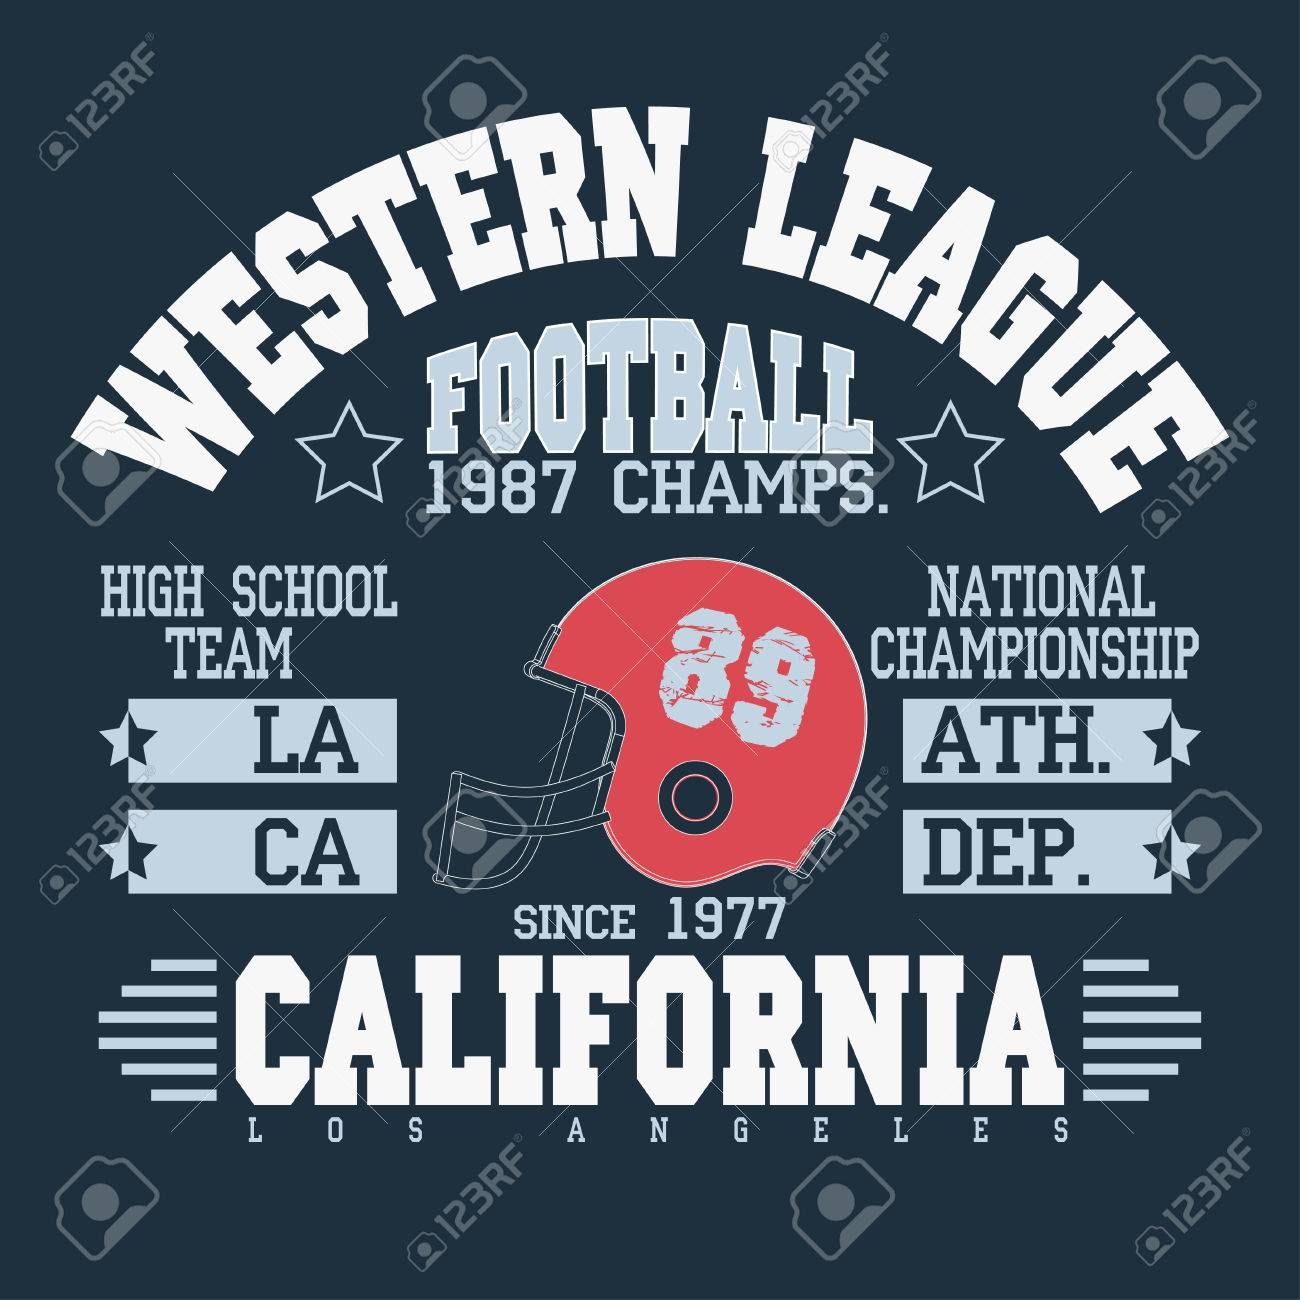 0e196b45d California Sport Typography, Football Athletic T-shirt fashion design  graphics, Vintage Print for